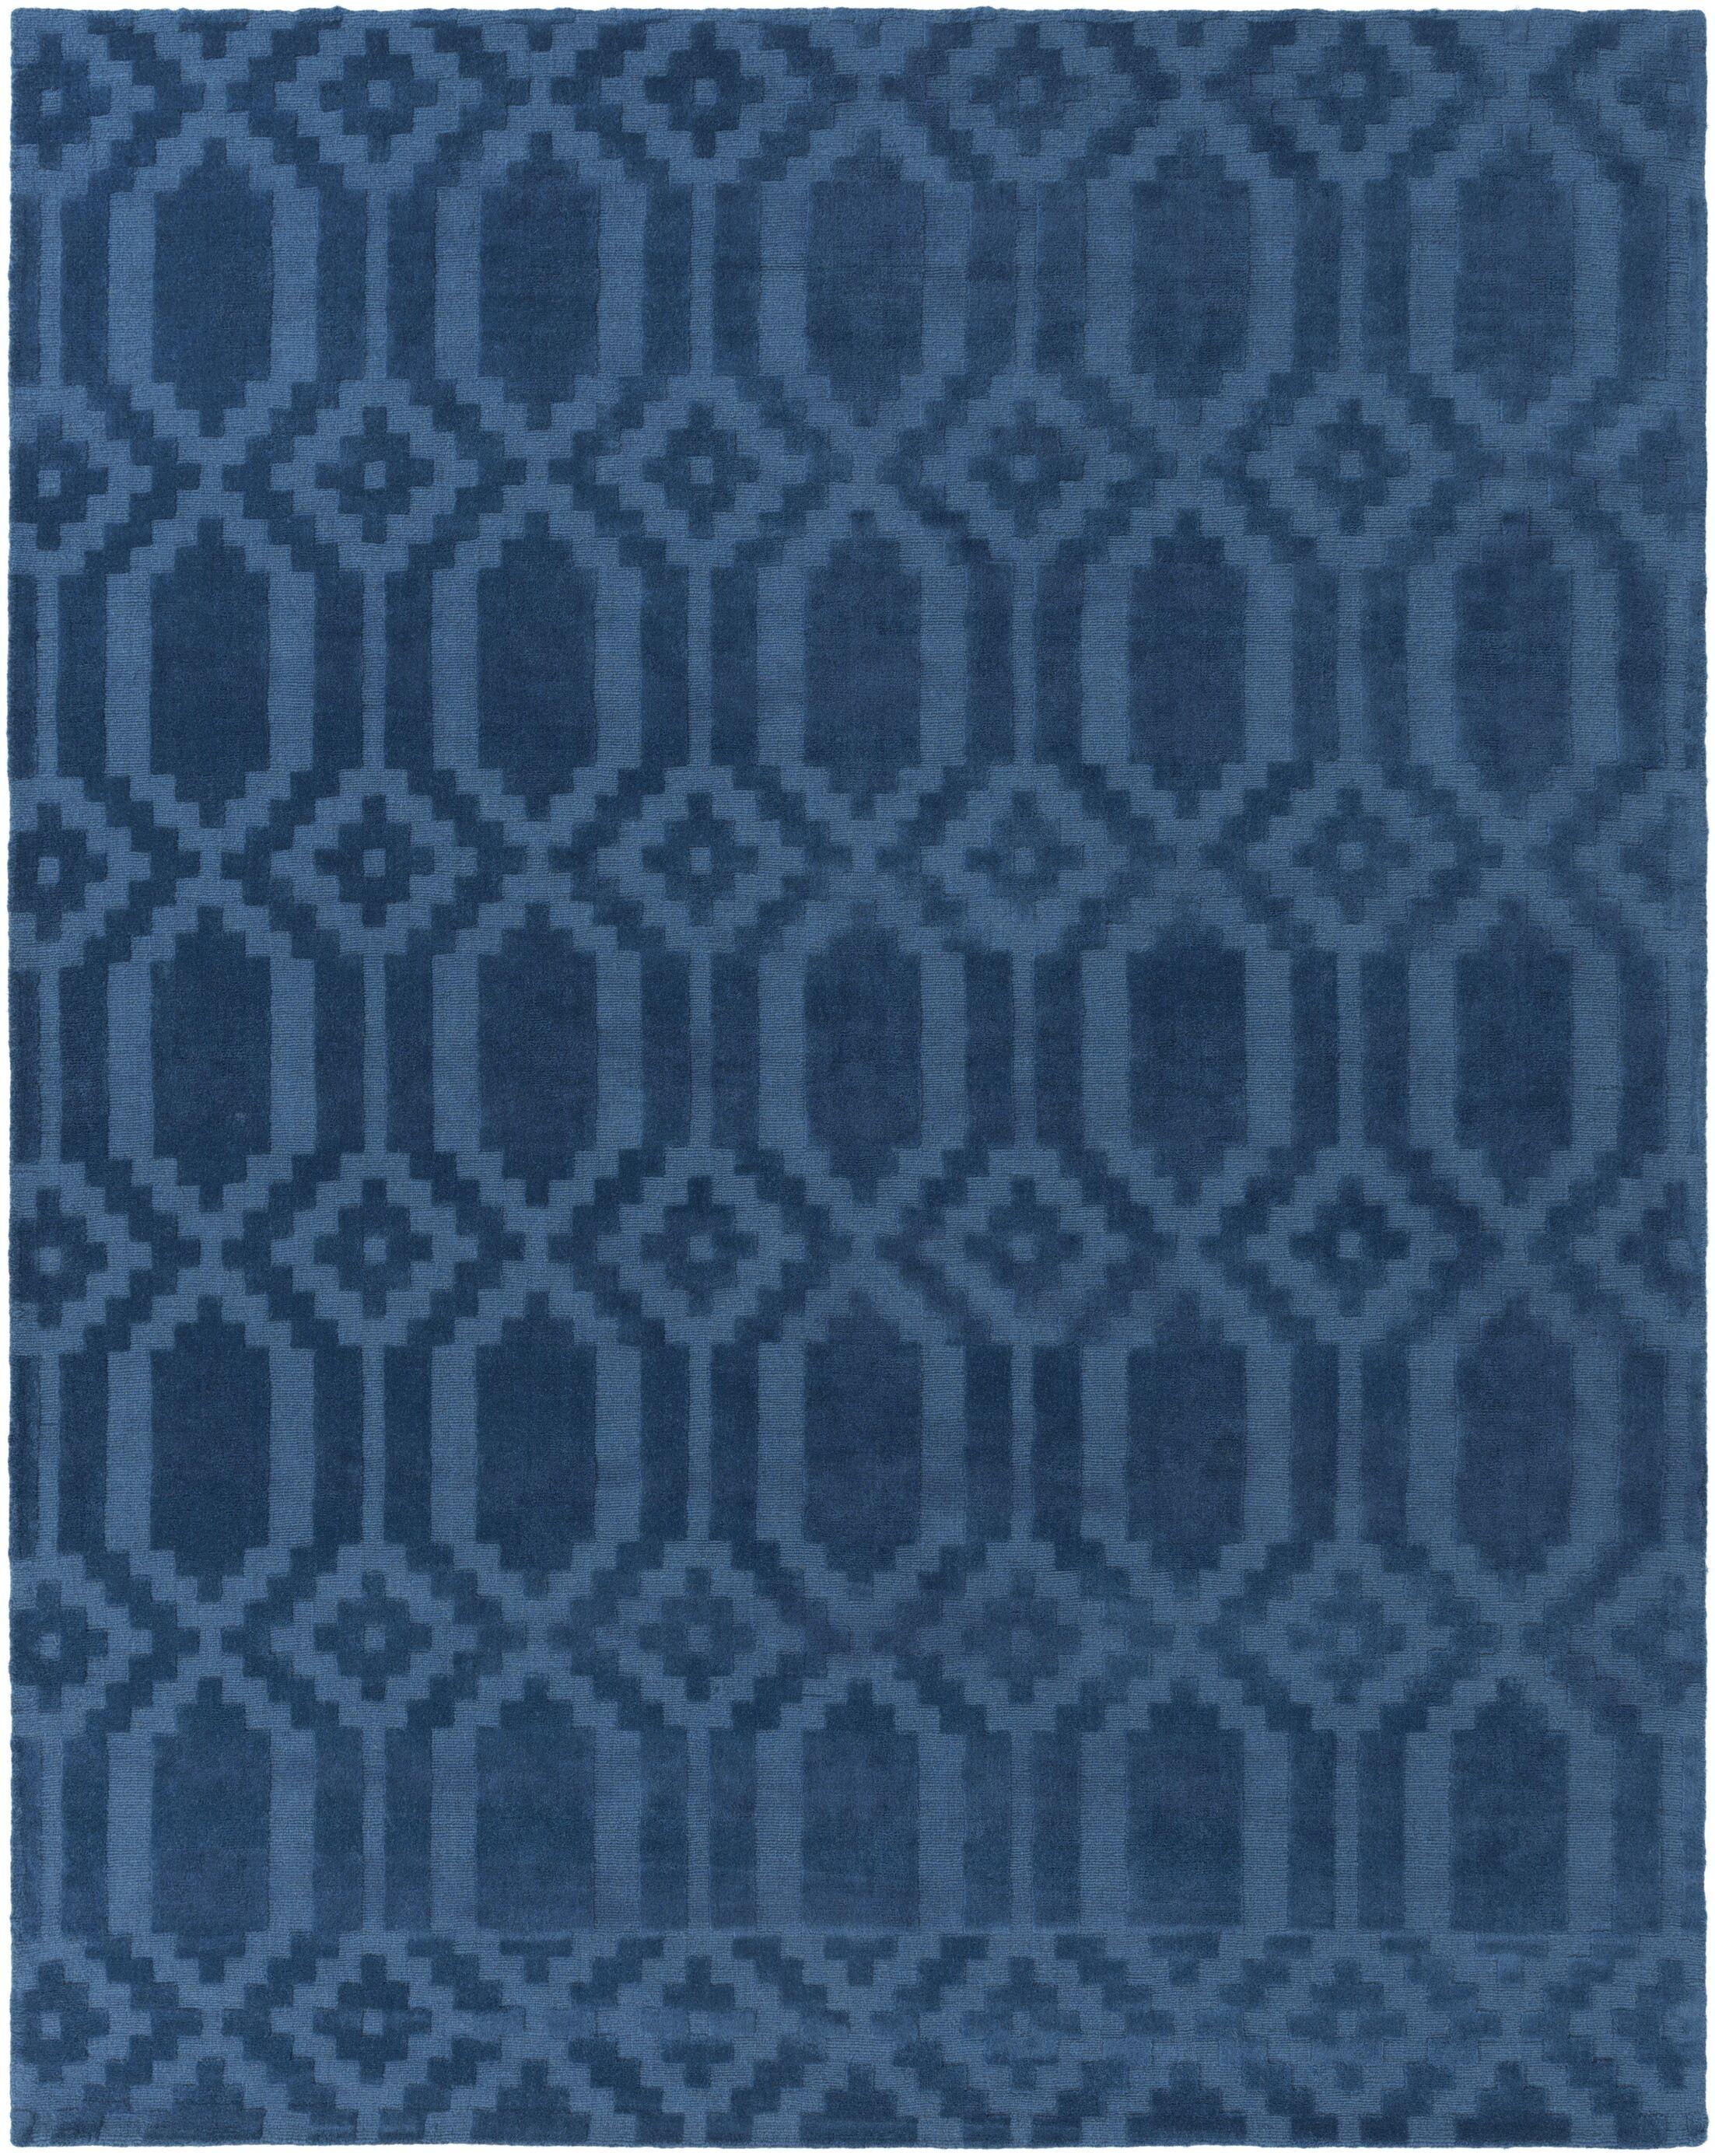 Brack Hand-Loomed Blue Area Rug Rug Size: Rectangle 10' x 14'